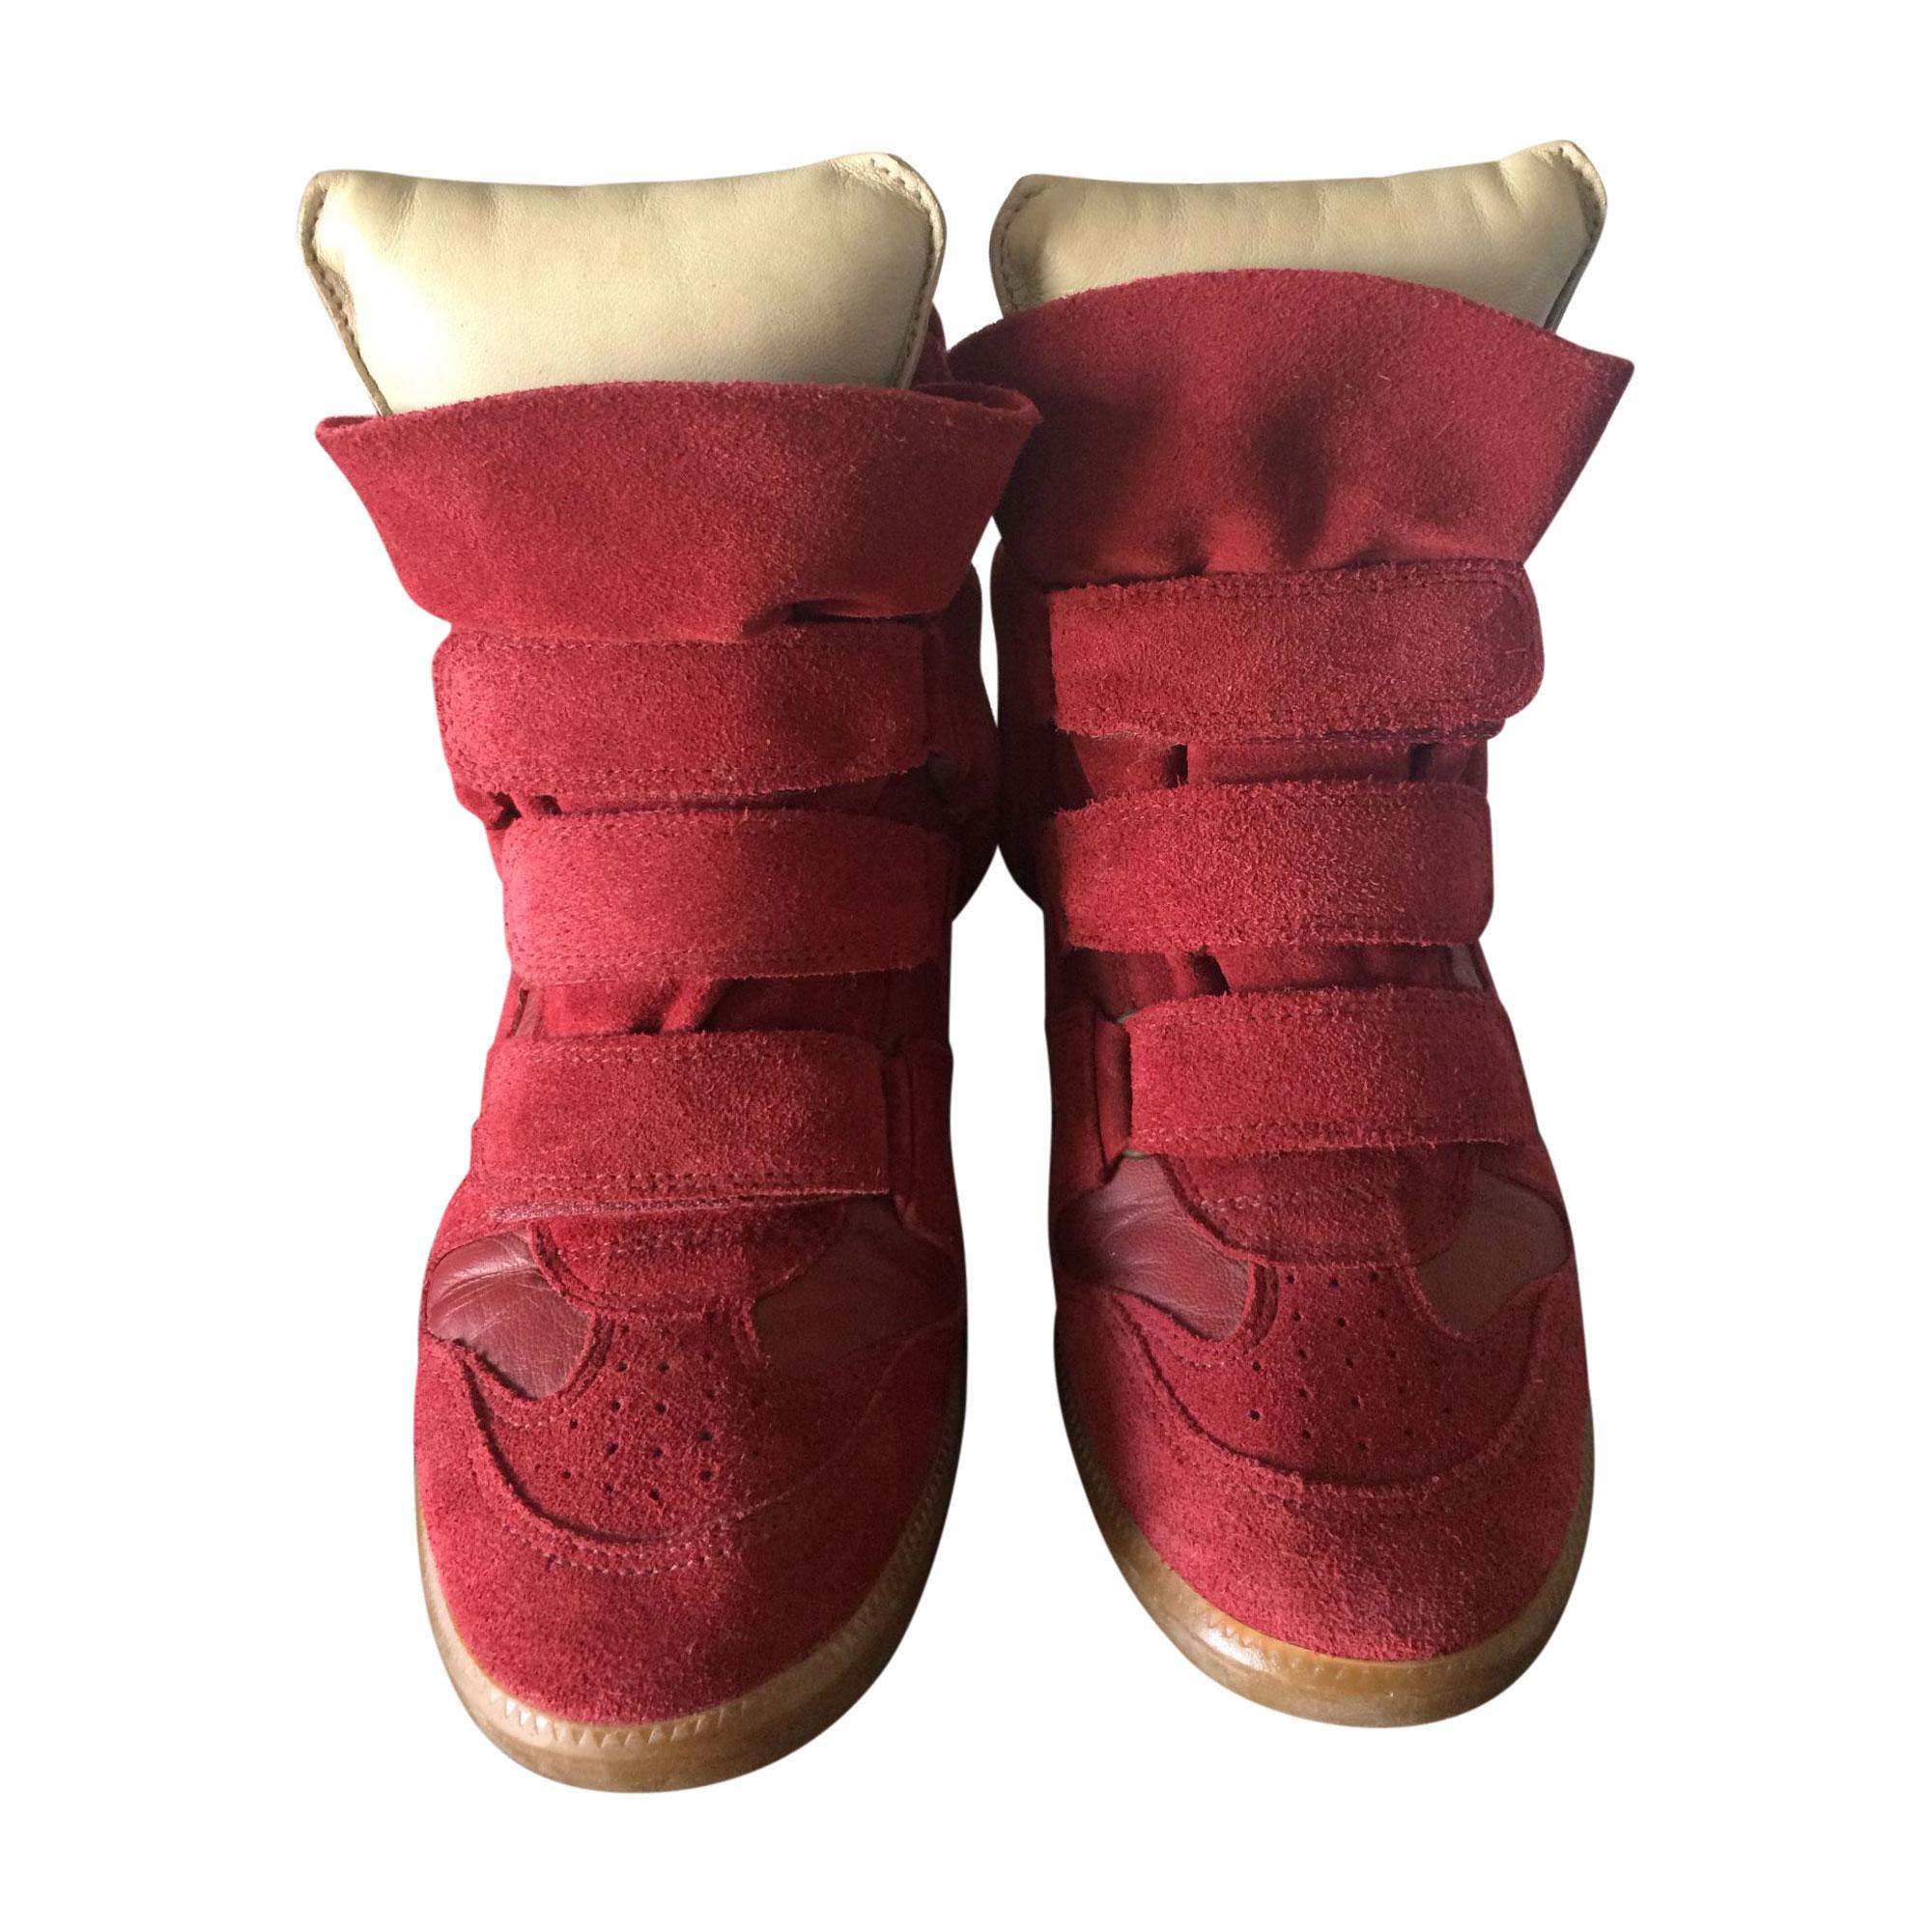 85420feaca Sneakers ISABEL MARANT 37 red - 7829758